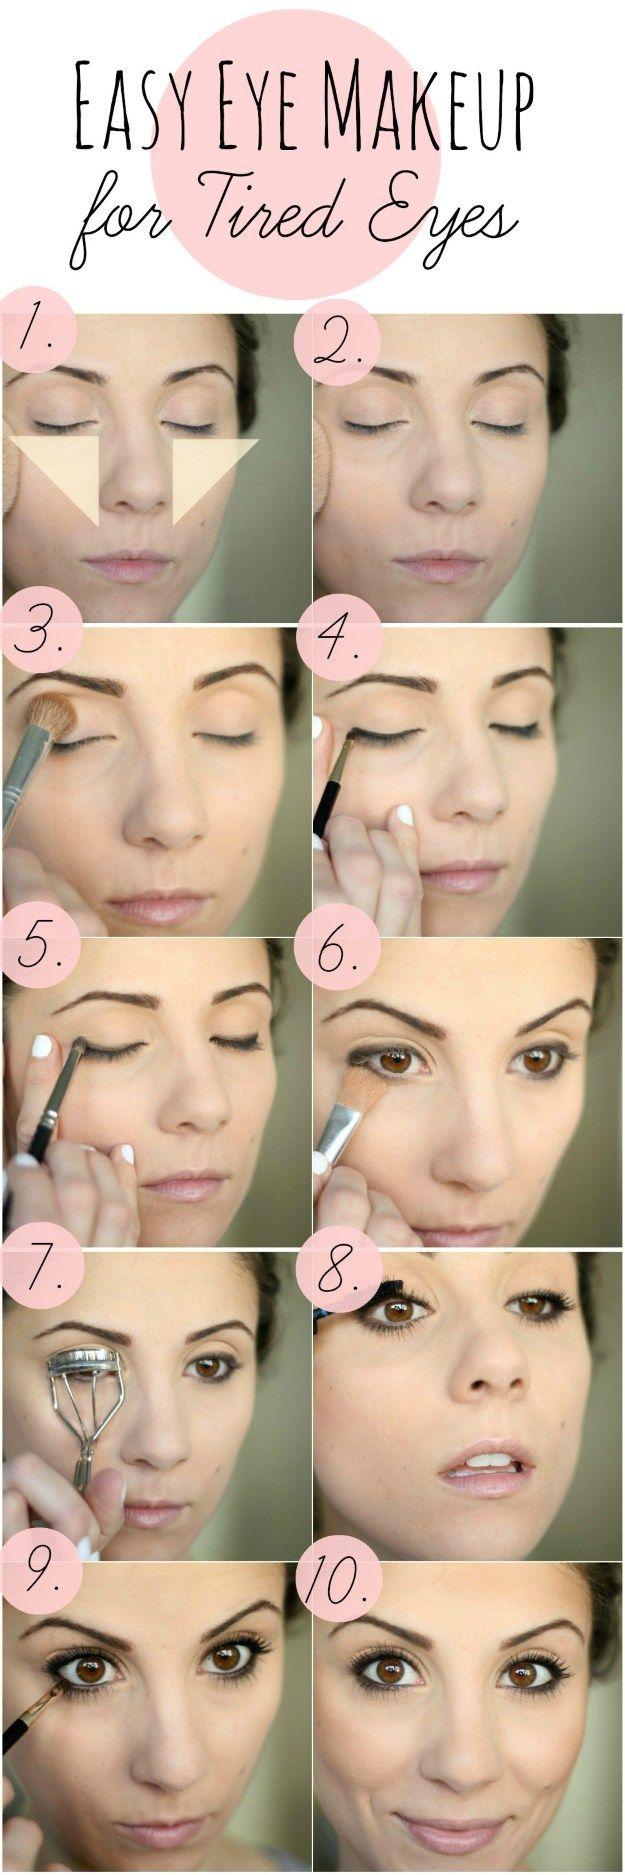 Quick makeup for work tutorials makeup tutorials and eye quick makeup for work tutorials baditri Images